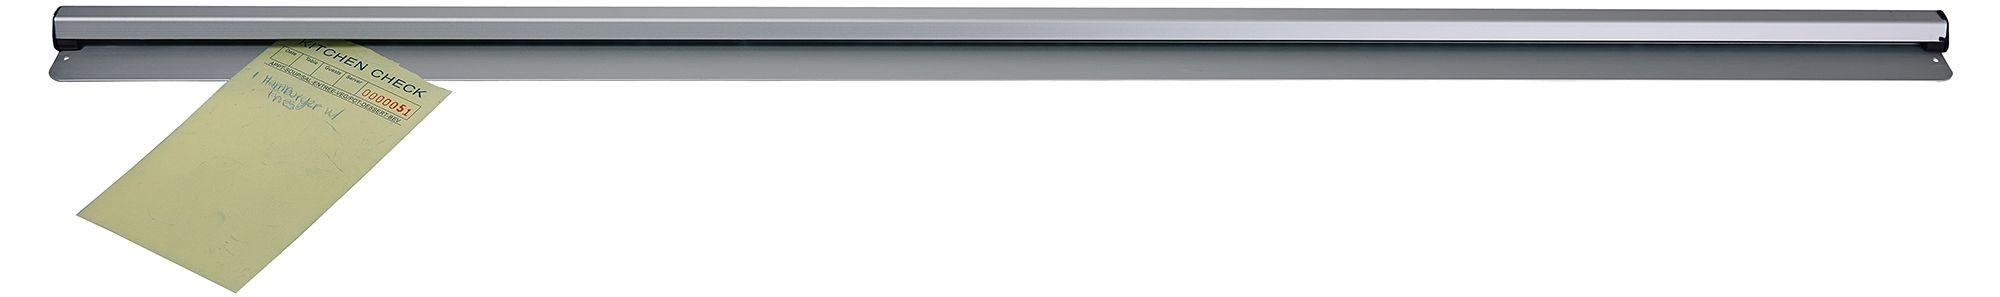 Aluminum Order Racks - 48